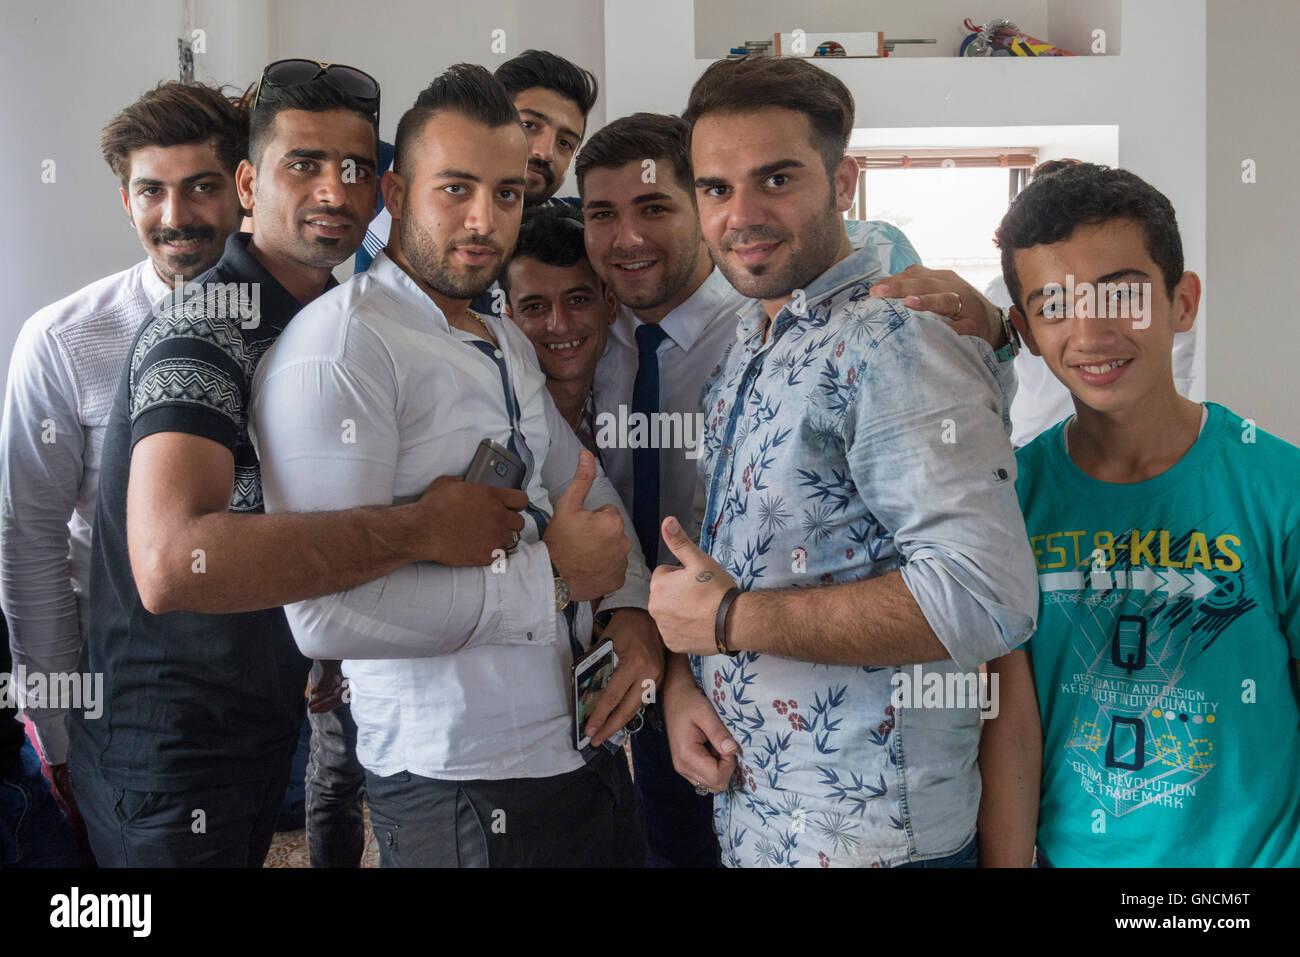 Bandar Torkaman, Turkmen Wedding, Guests In Men's Lunch Room - Stock Image